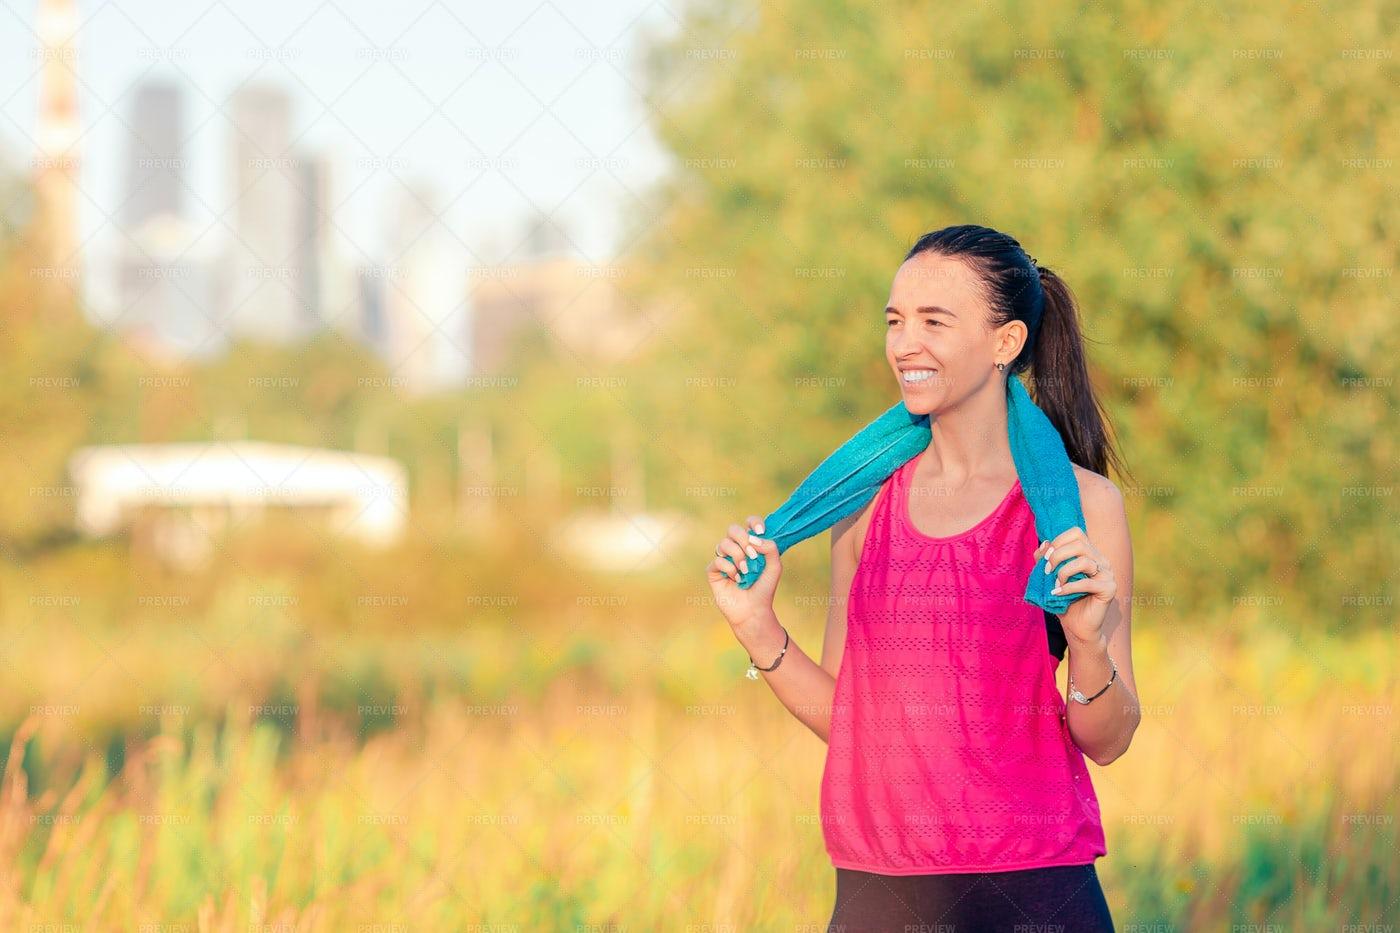 Smiling Woman Doing Sport Exercises: Stock Photos